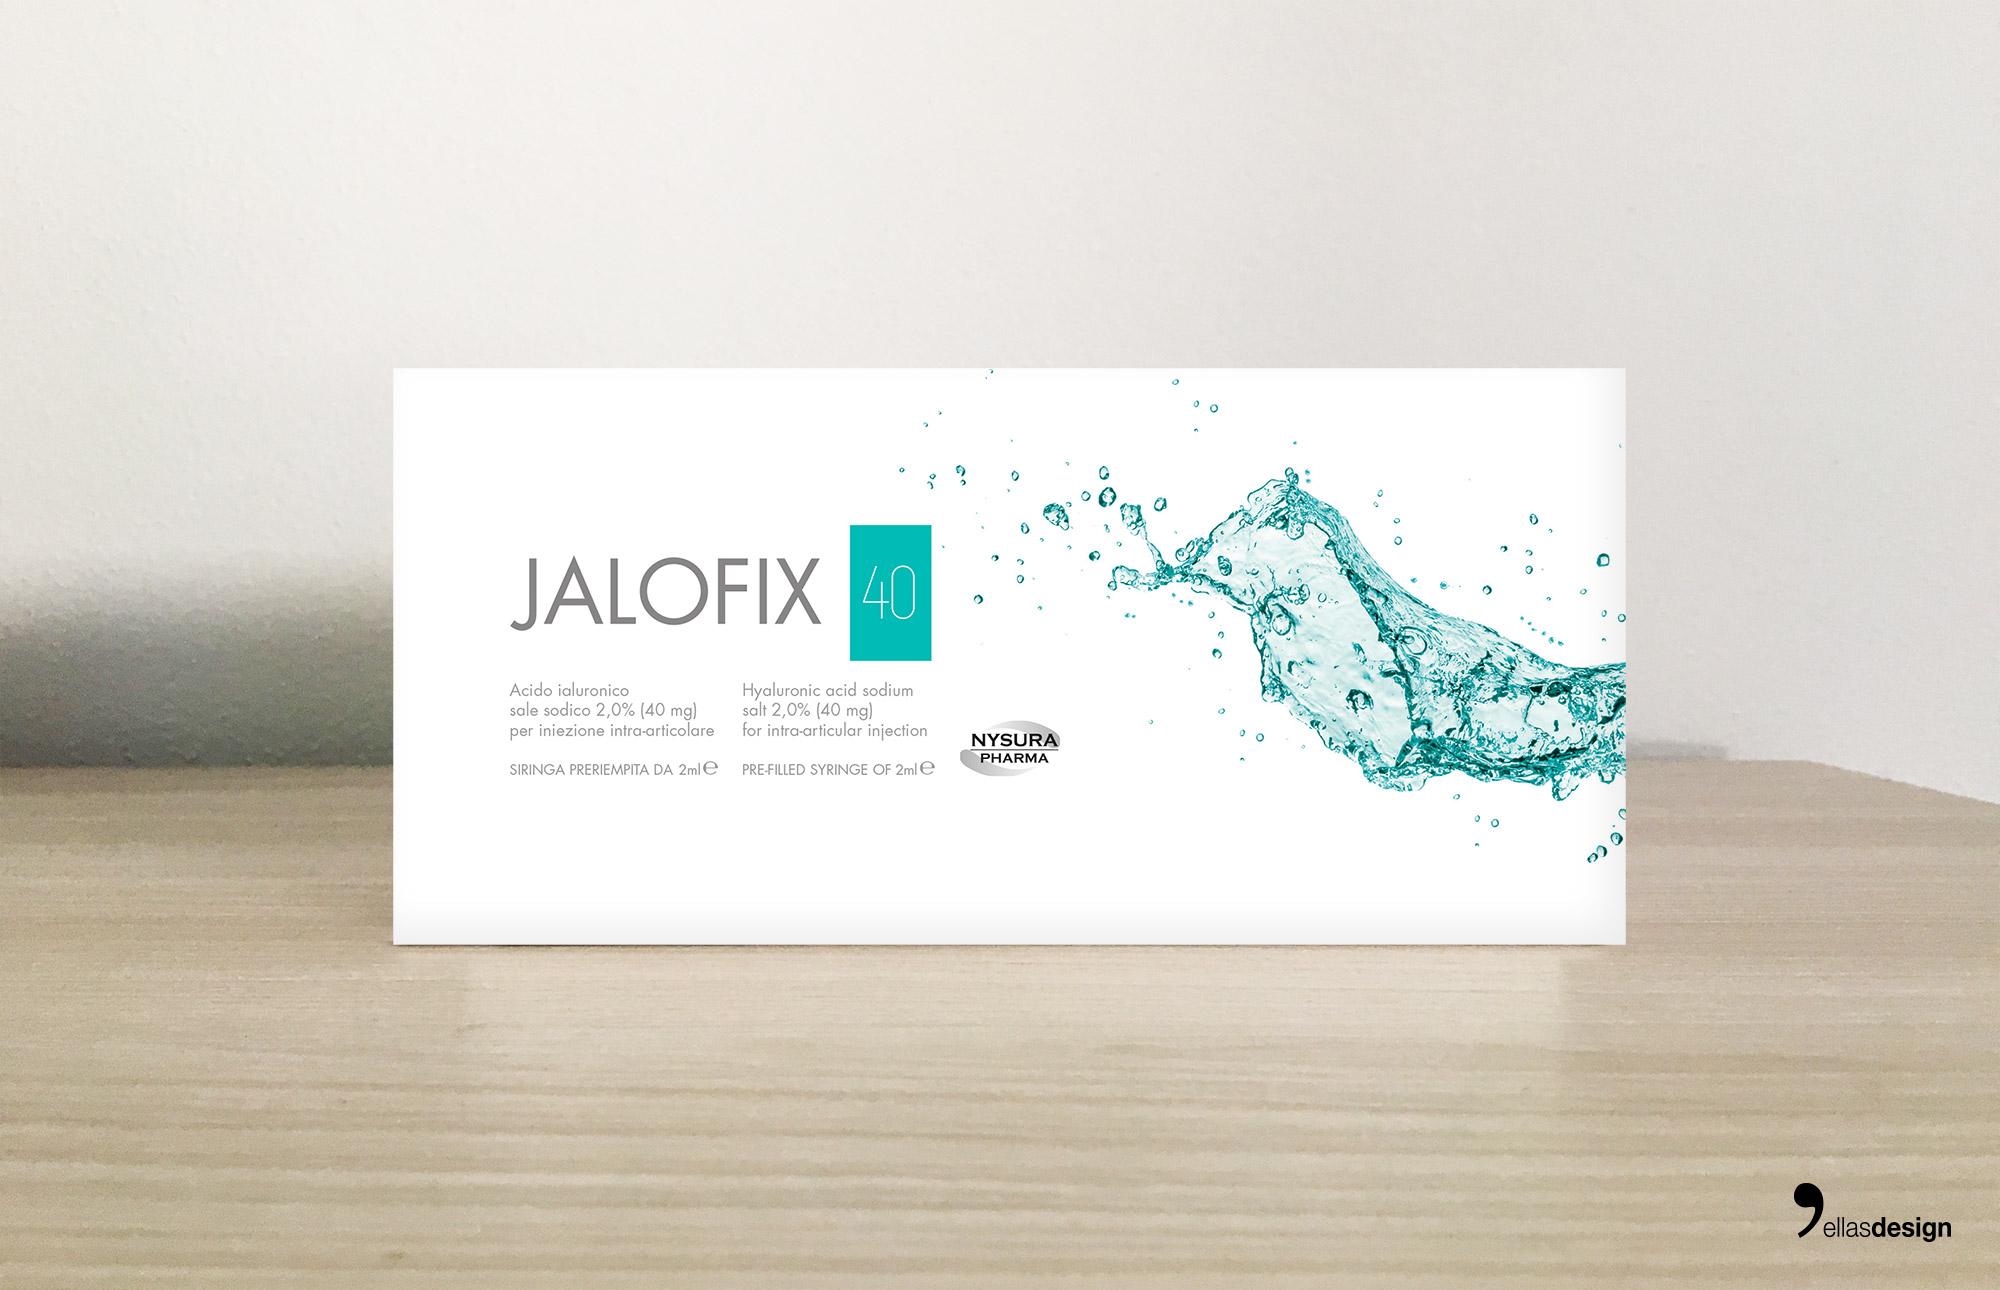 NYSURA PHARMA JALOFIX40 - Product Design